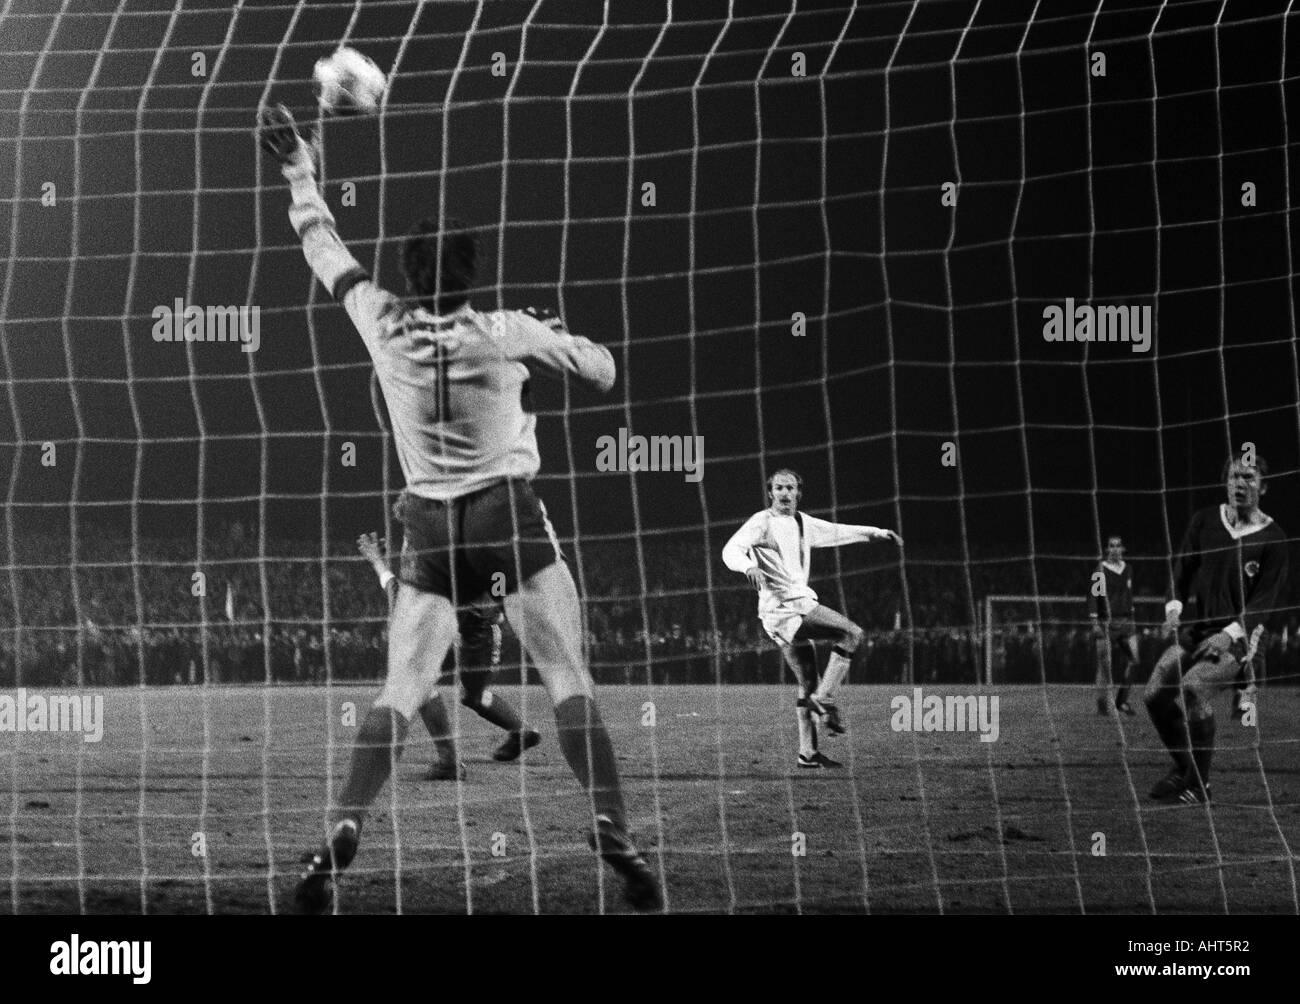 football, Bundesliga, 1970/1971, Rot-Weiss Oberhausen versus Borussia Moenchengladbach 0:2, Niederrhein Stadium in Oberhausen, scene of the match, Horst Koeppel (MG) middle shots on goal, left keeper Wolfgang Scheid, right Lothar Kobluhn (both RWO) - Stock Image